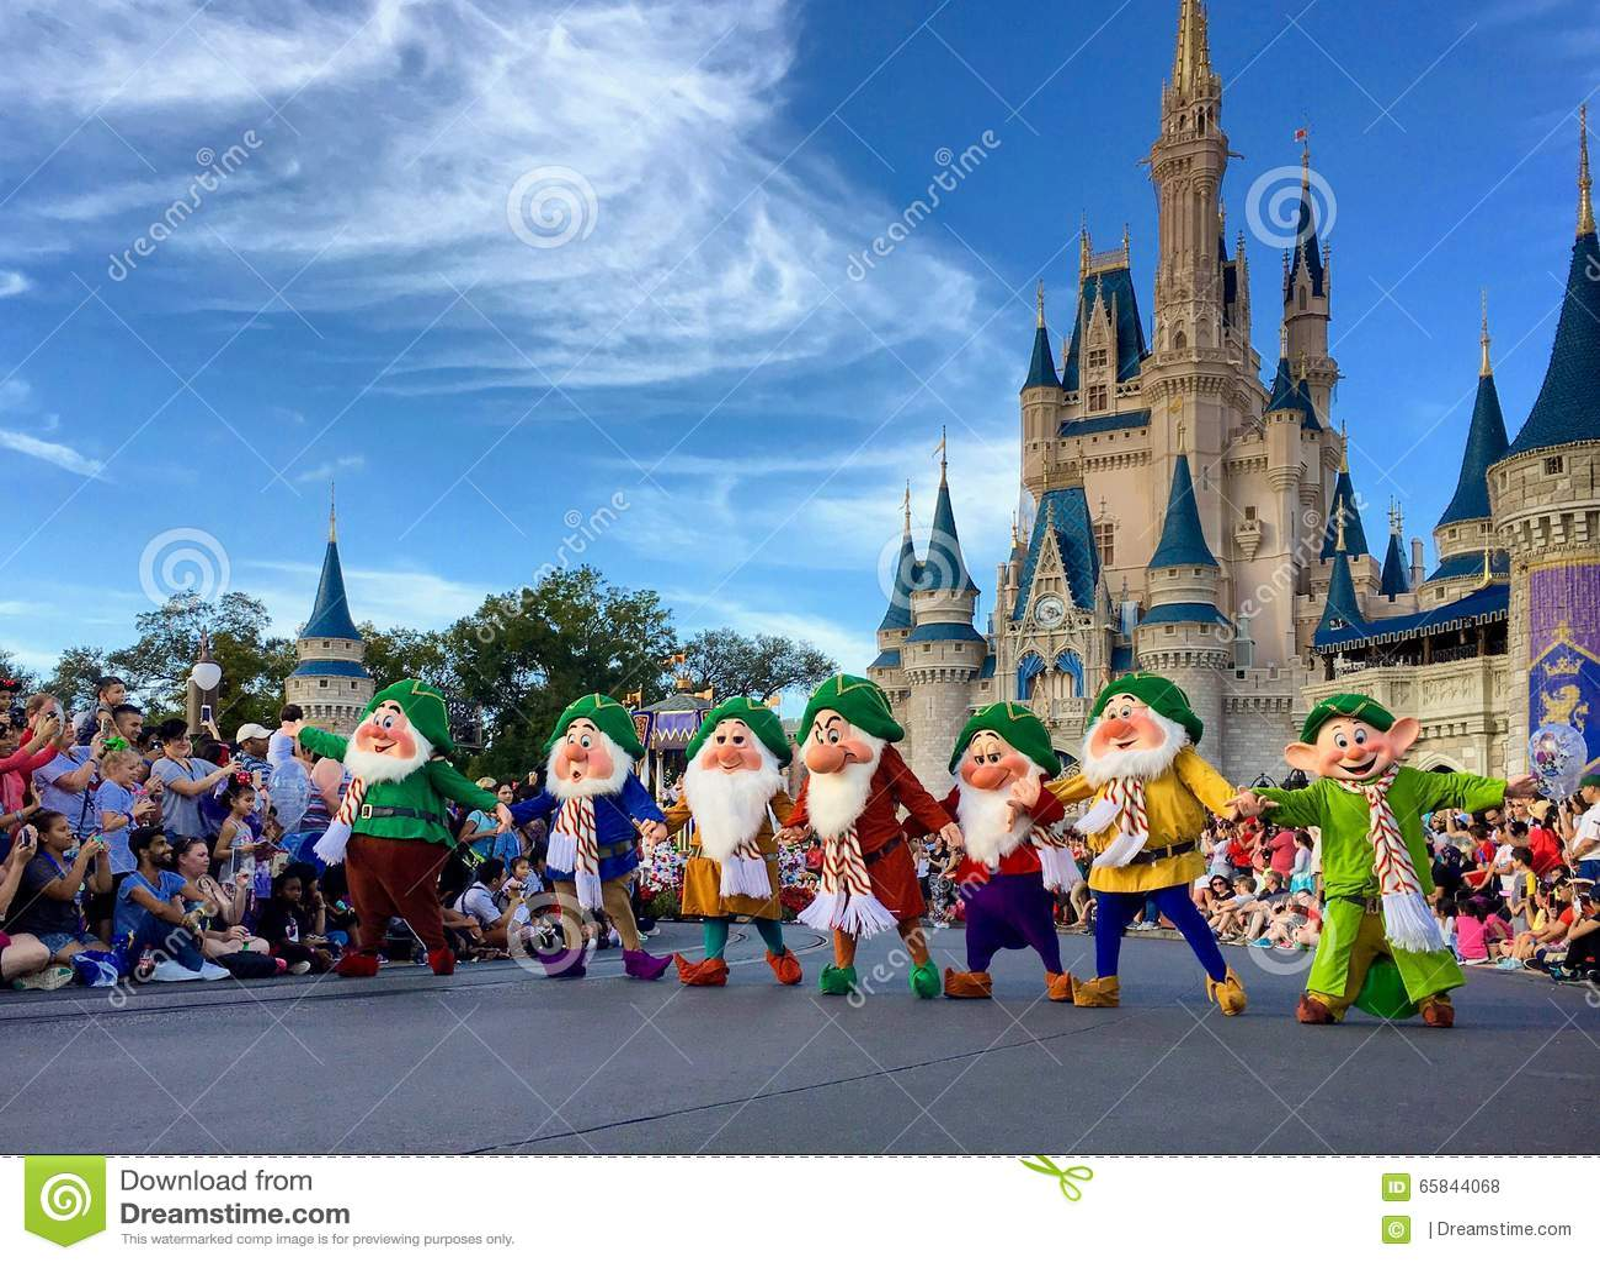 seven dwarfs performancing at walt disney world christmas party - Disney Christmas Party 2015